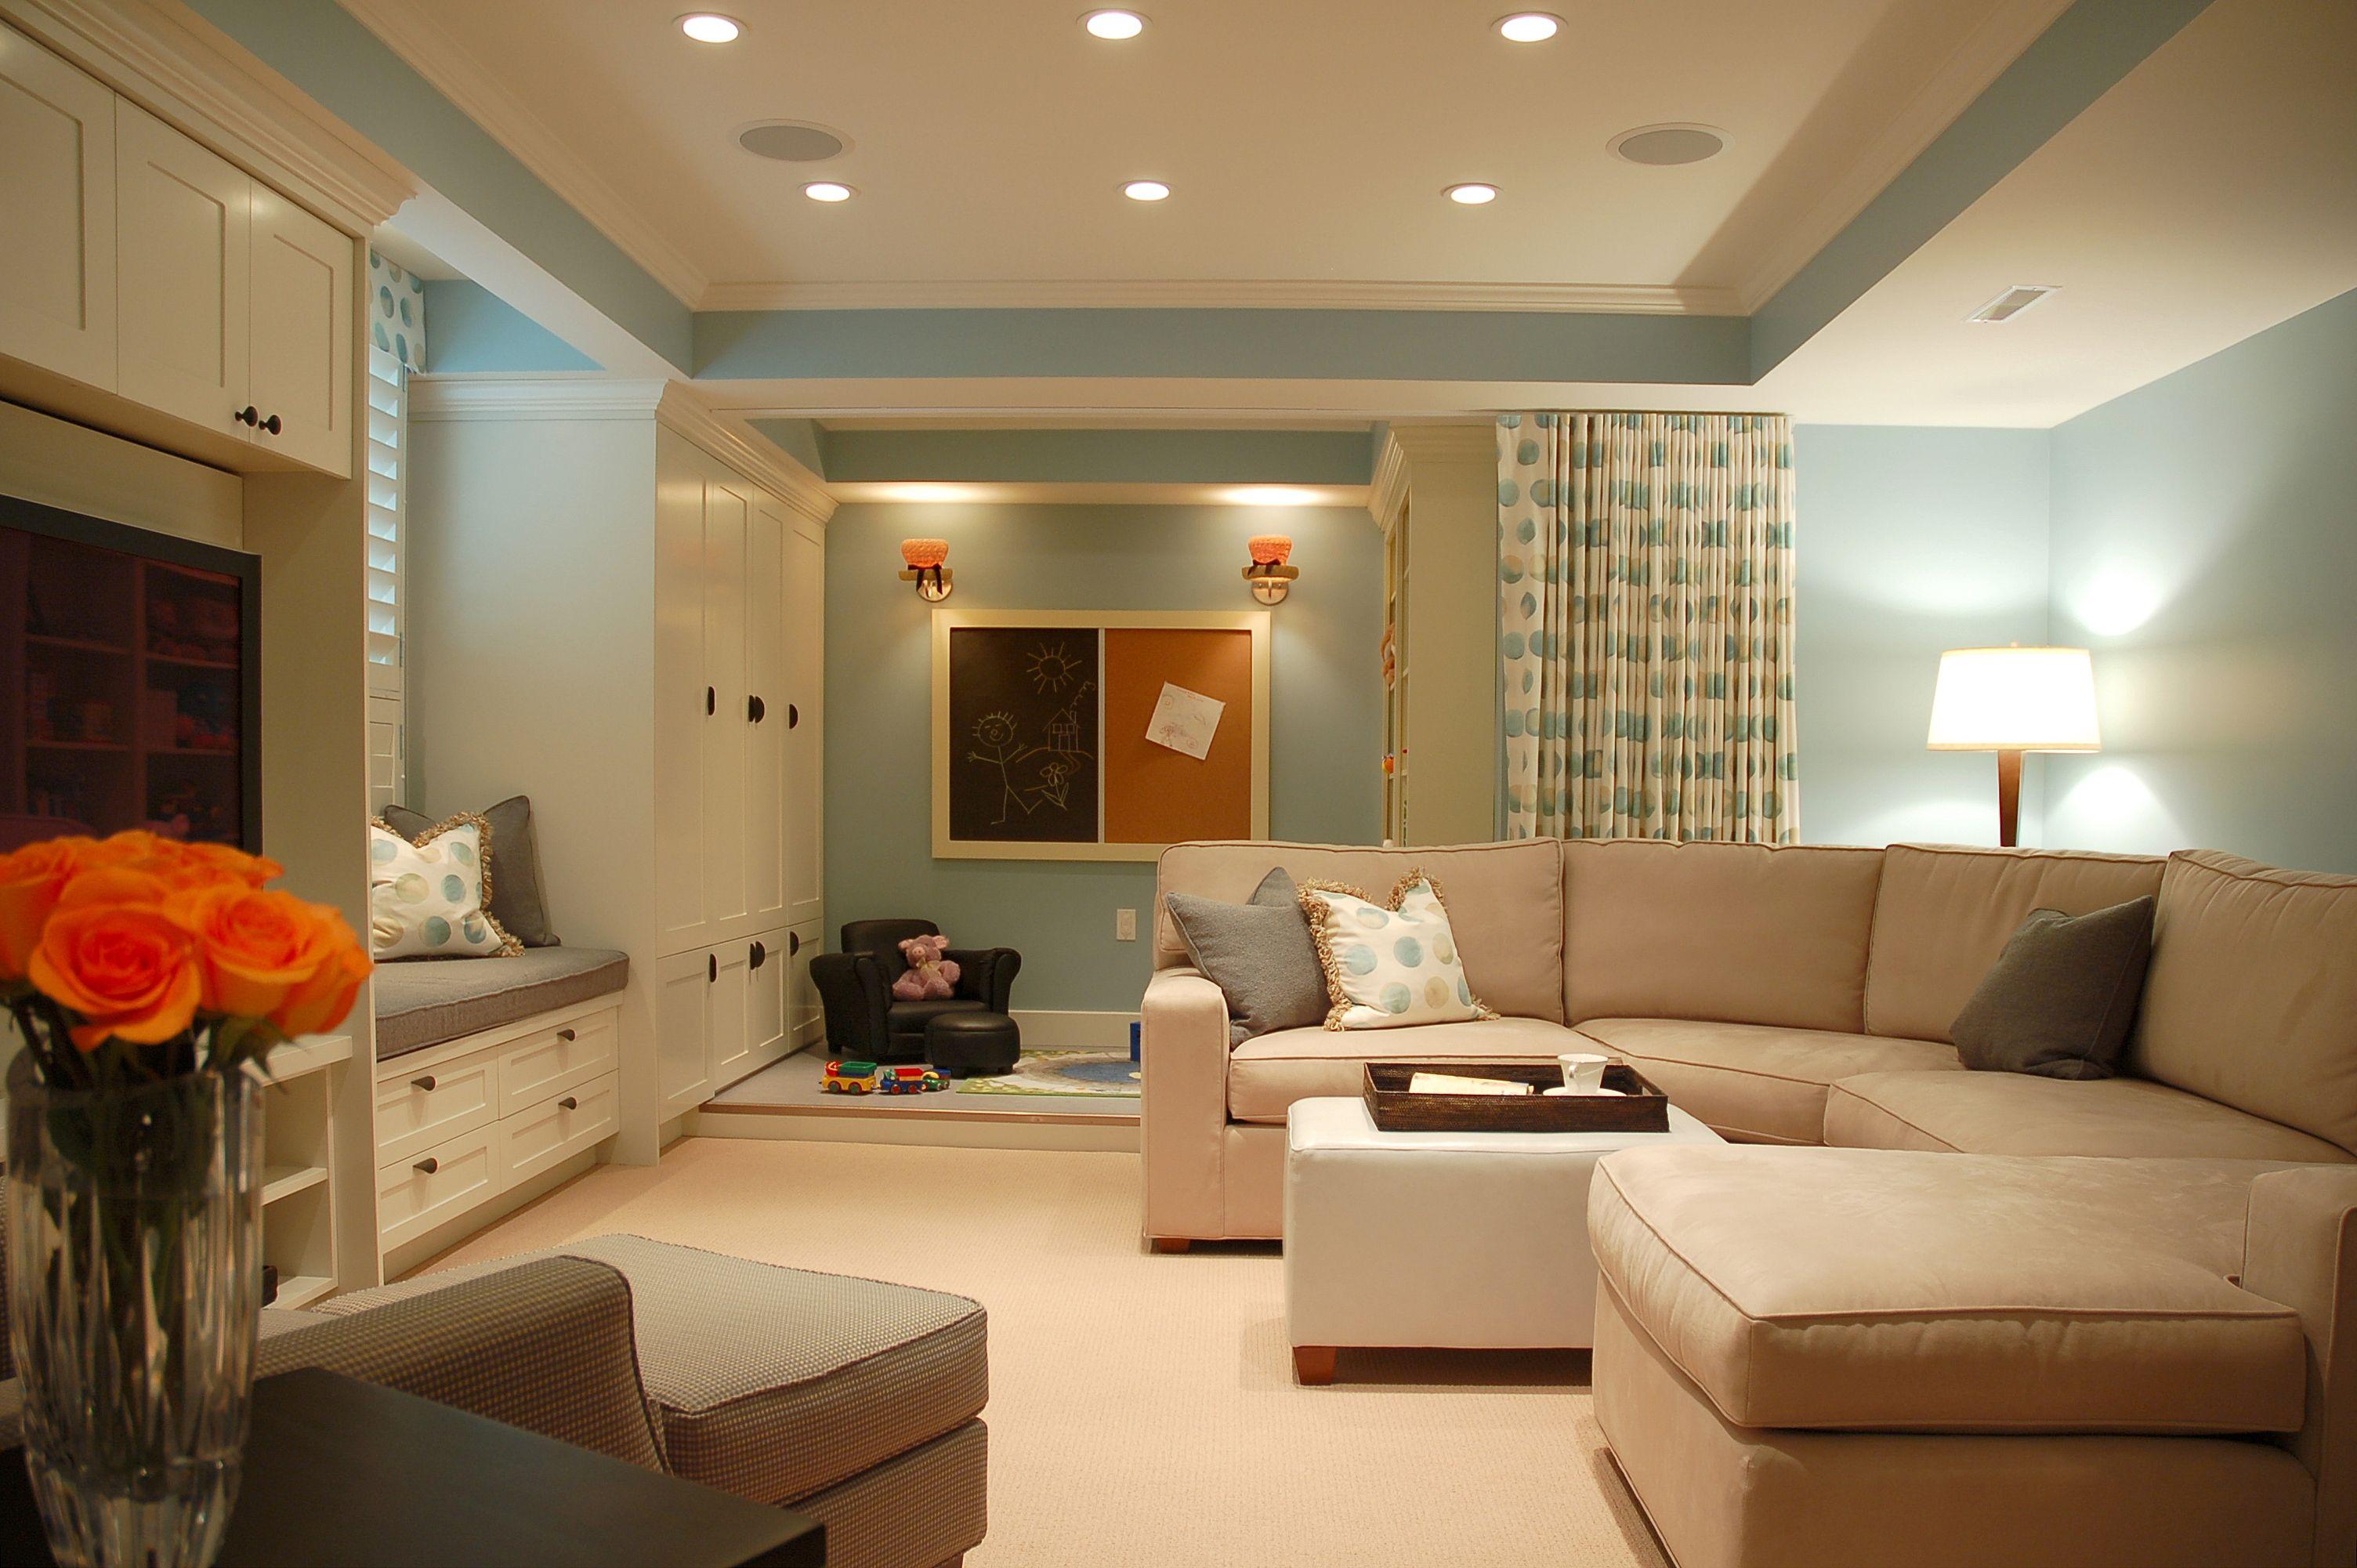 lighting ideas ceiling basement media room. 27 Awesome HomeWith Media Room Ideas \u0026 Design(Amazing Pictures) - This Lighting Ceiling Basement